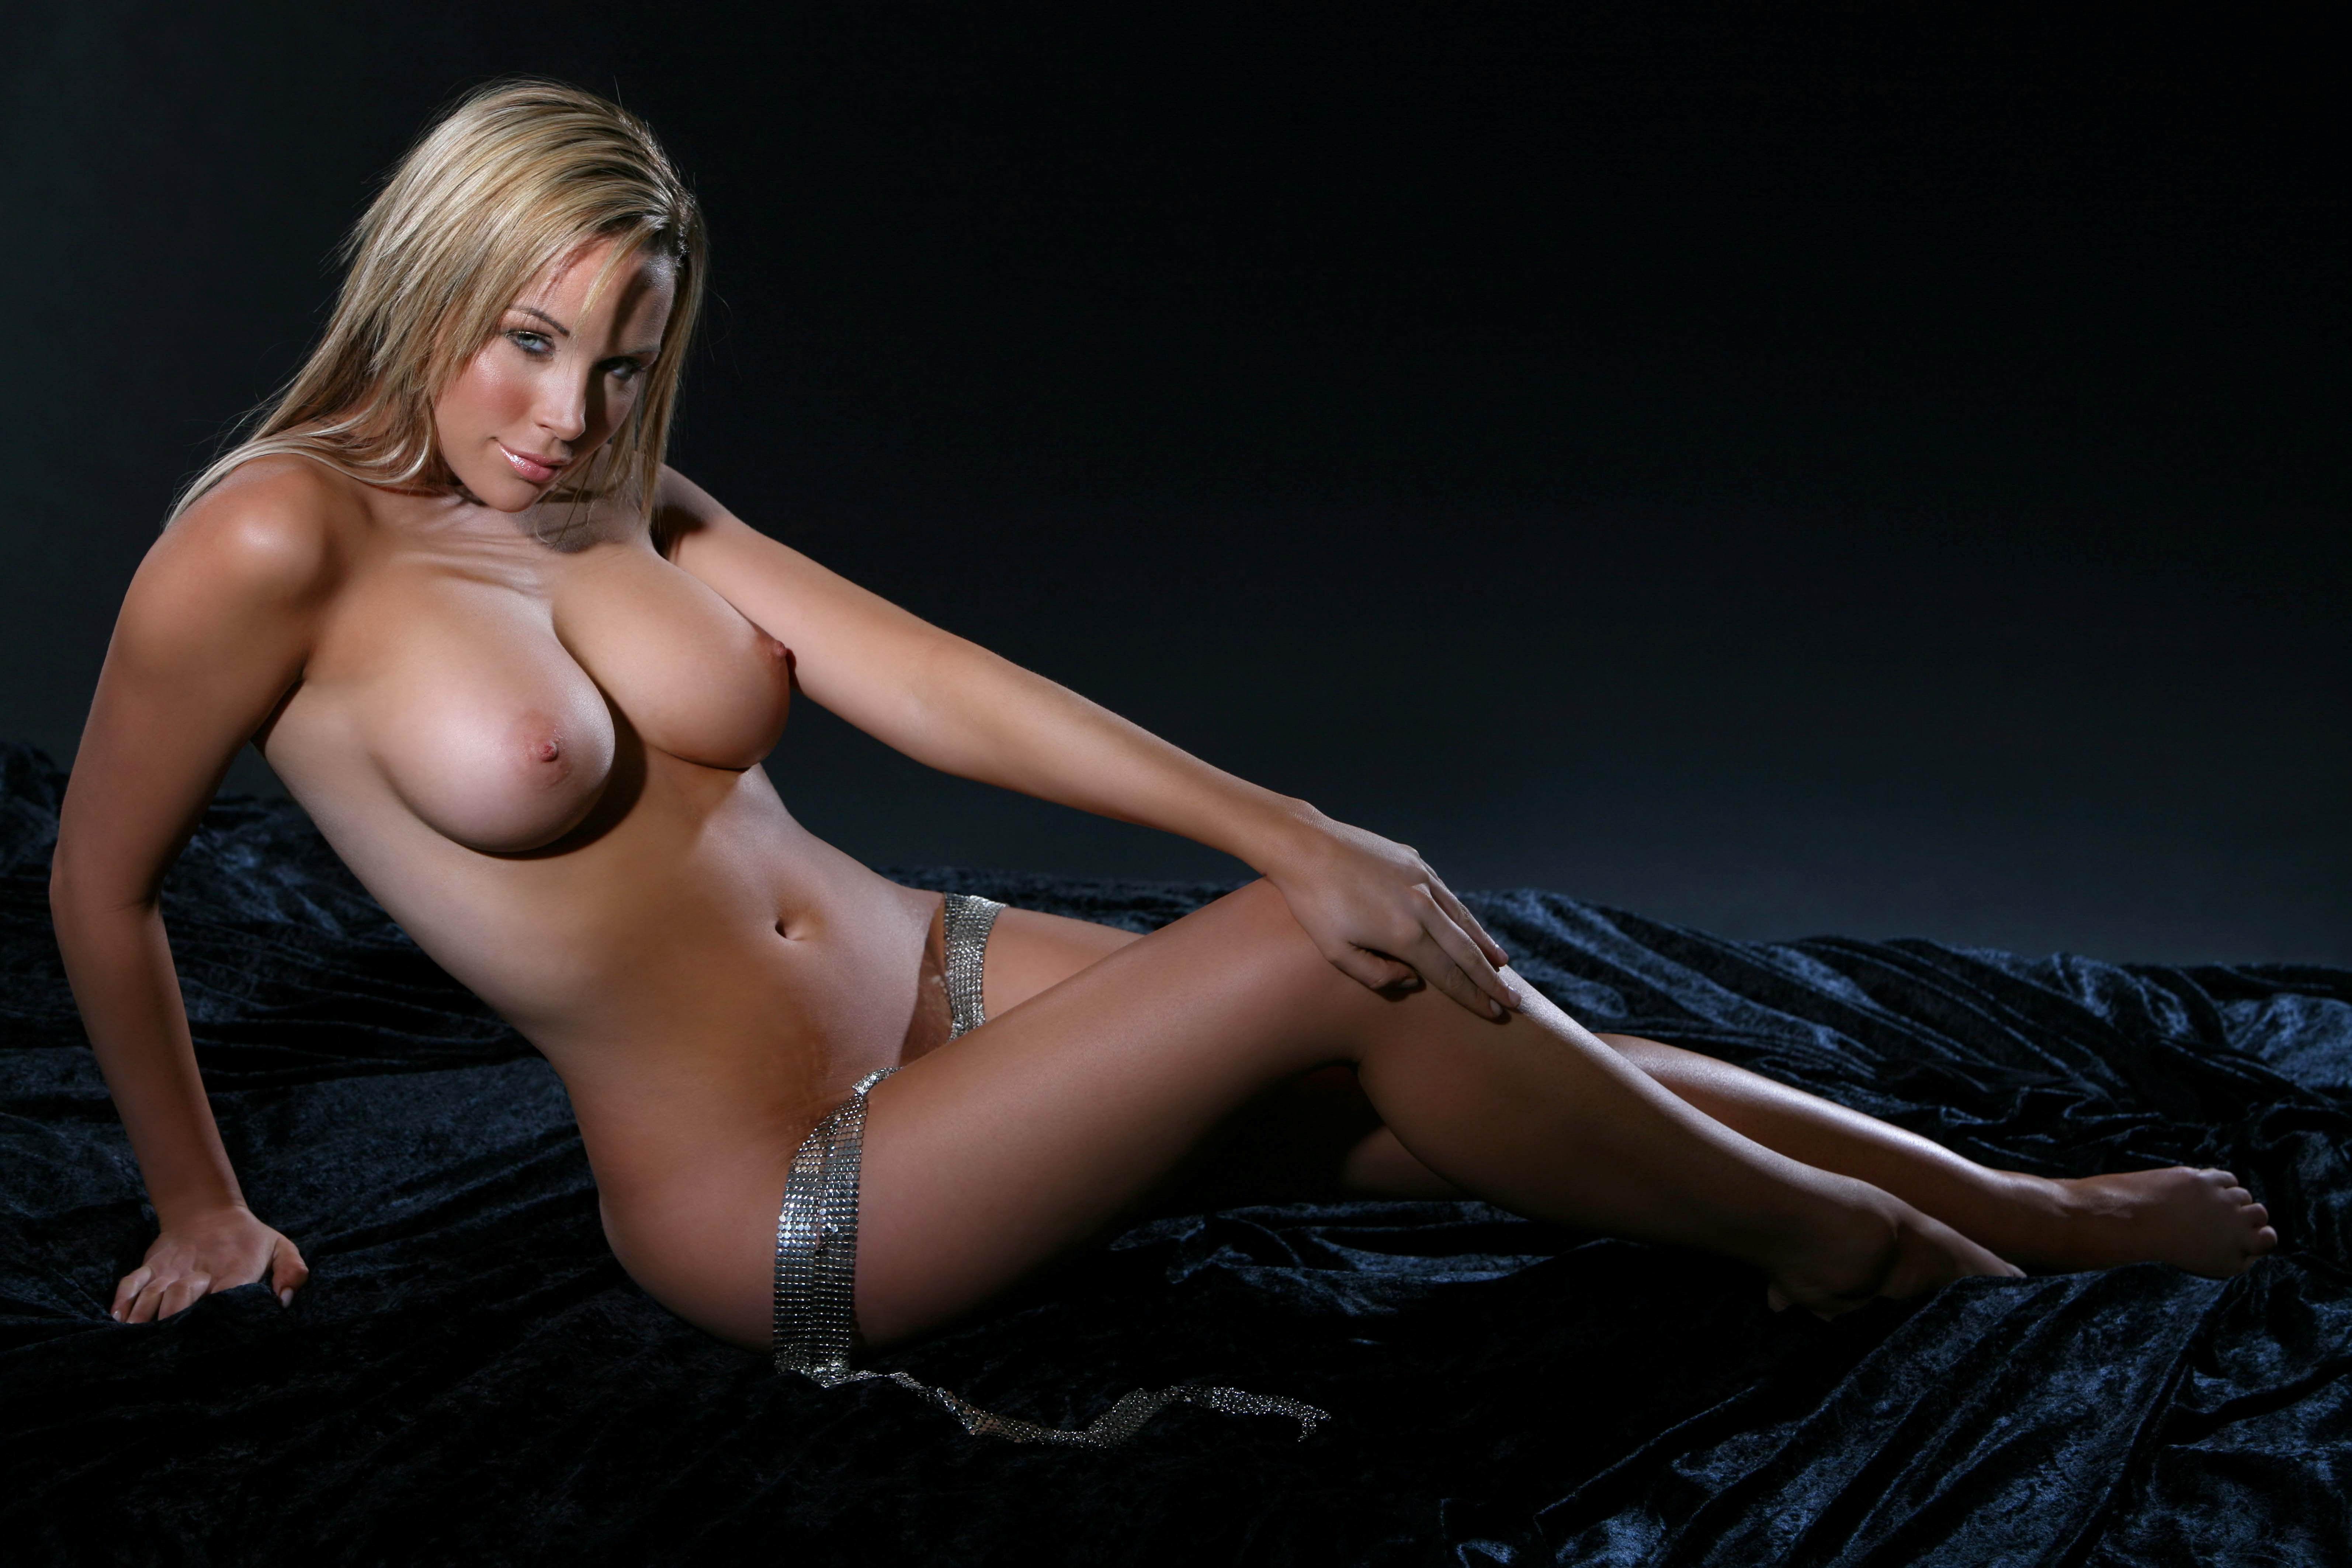 Sextiny photos naked